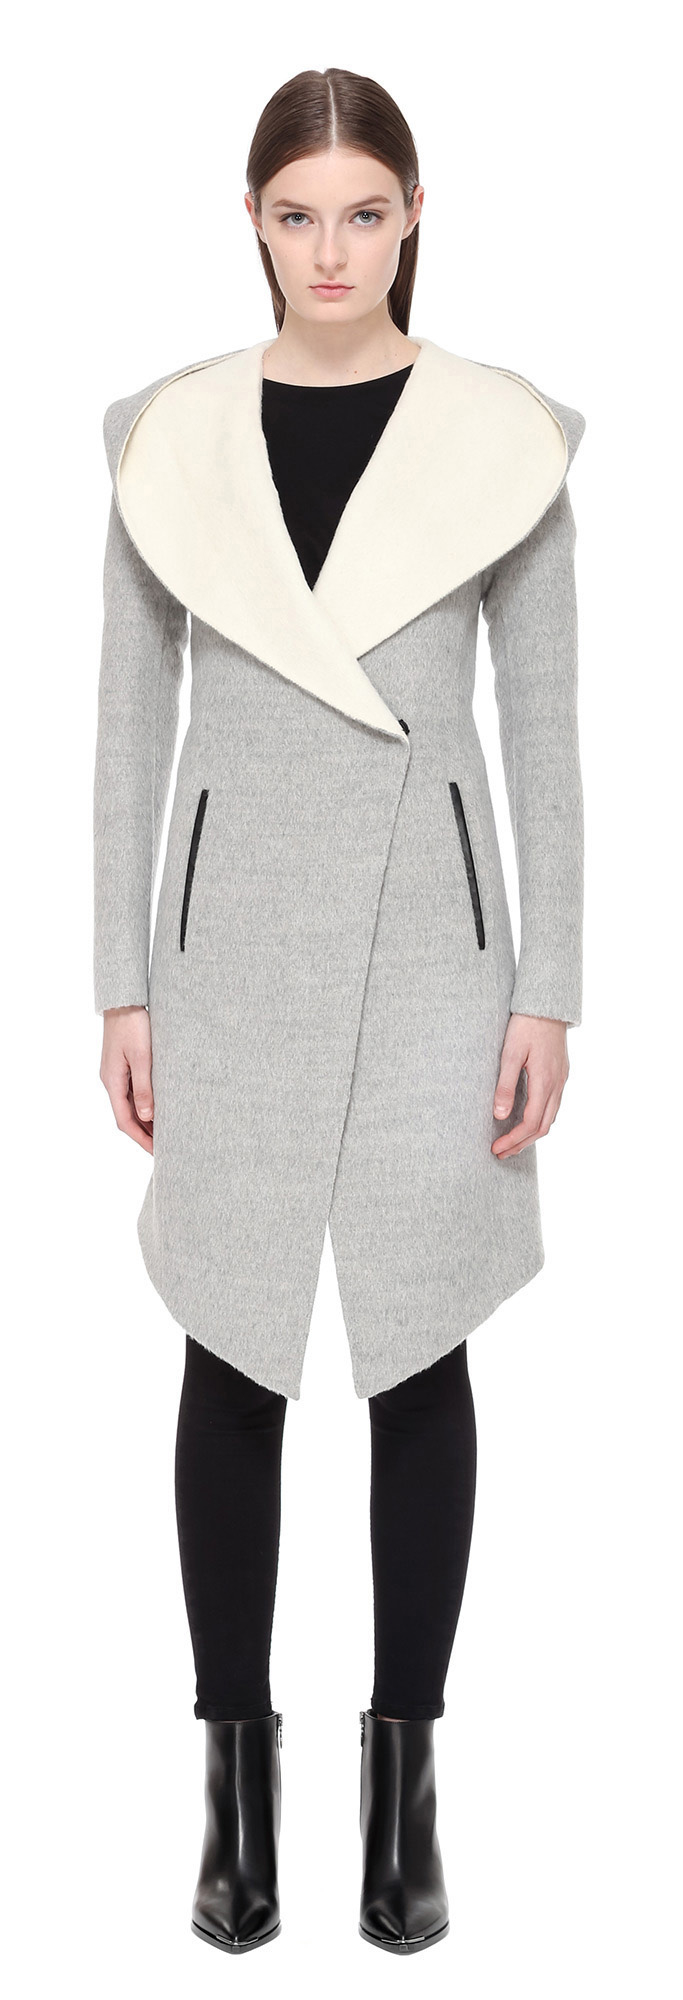 Mackage Joslyn Wool Coat With Waterfall Hood In Grey/off White in ...